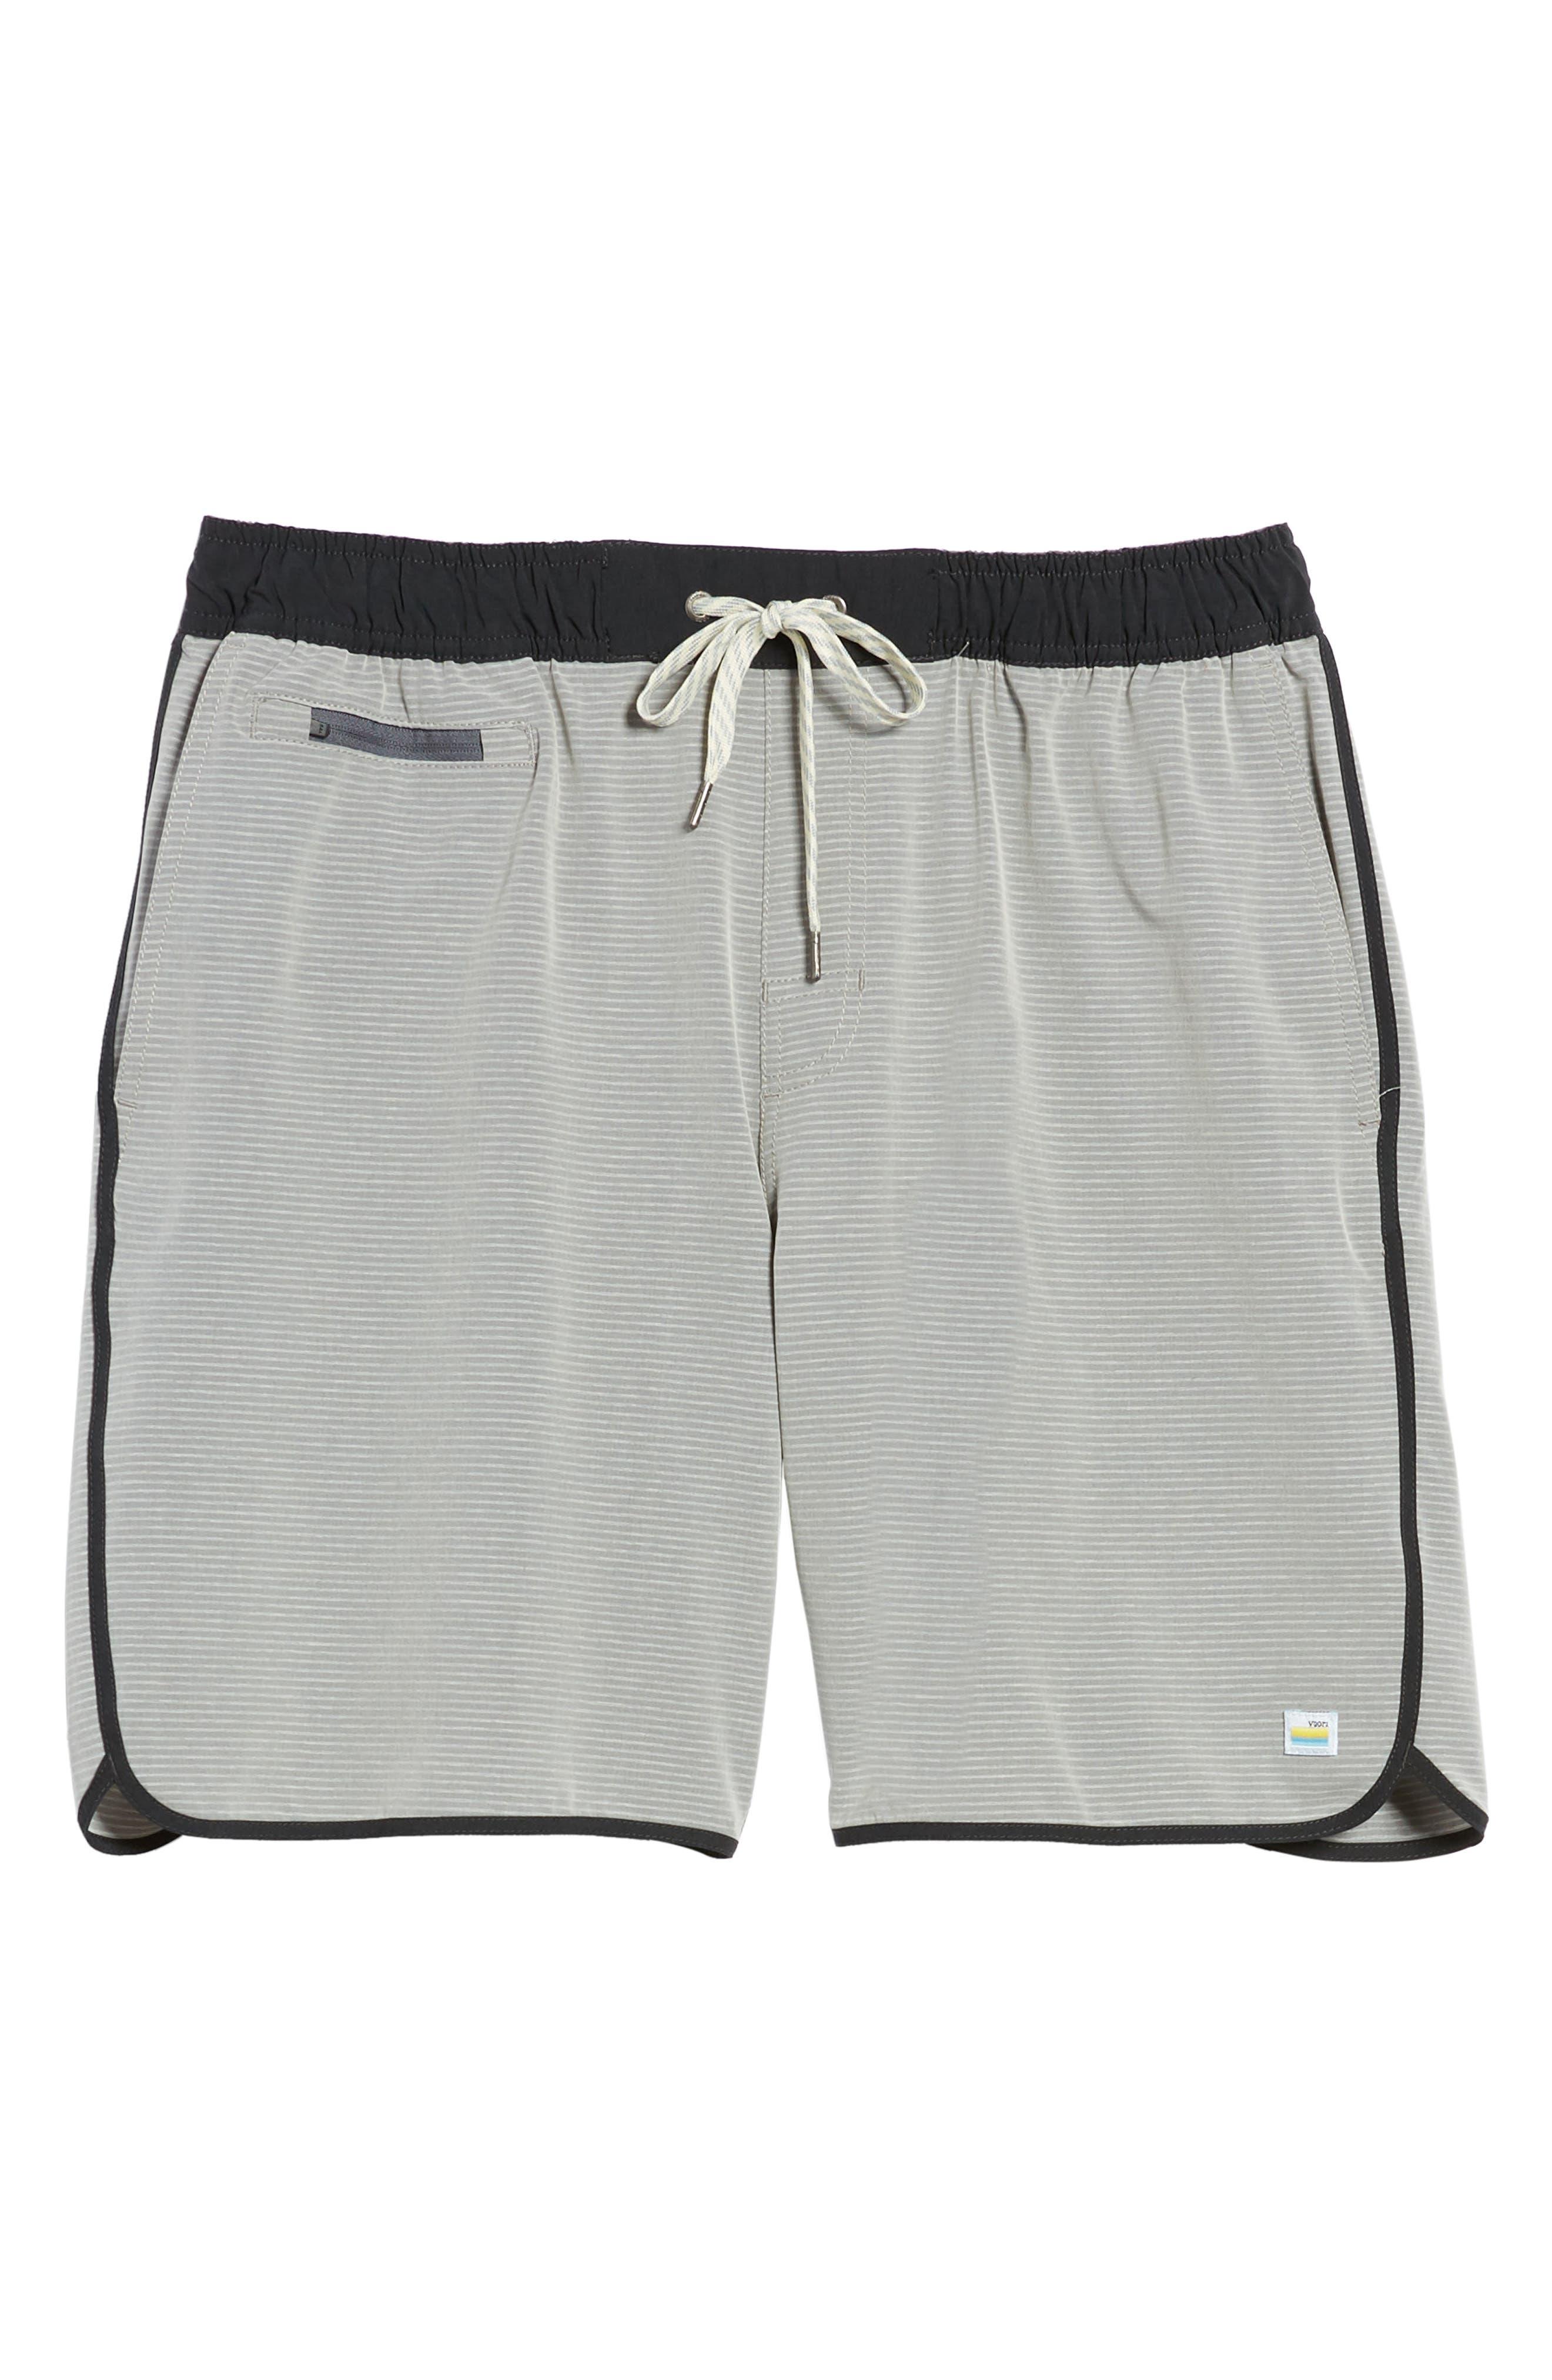 Banks Athletic Shorts,                             Alternate thumbnail 6, color,